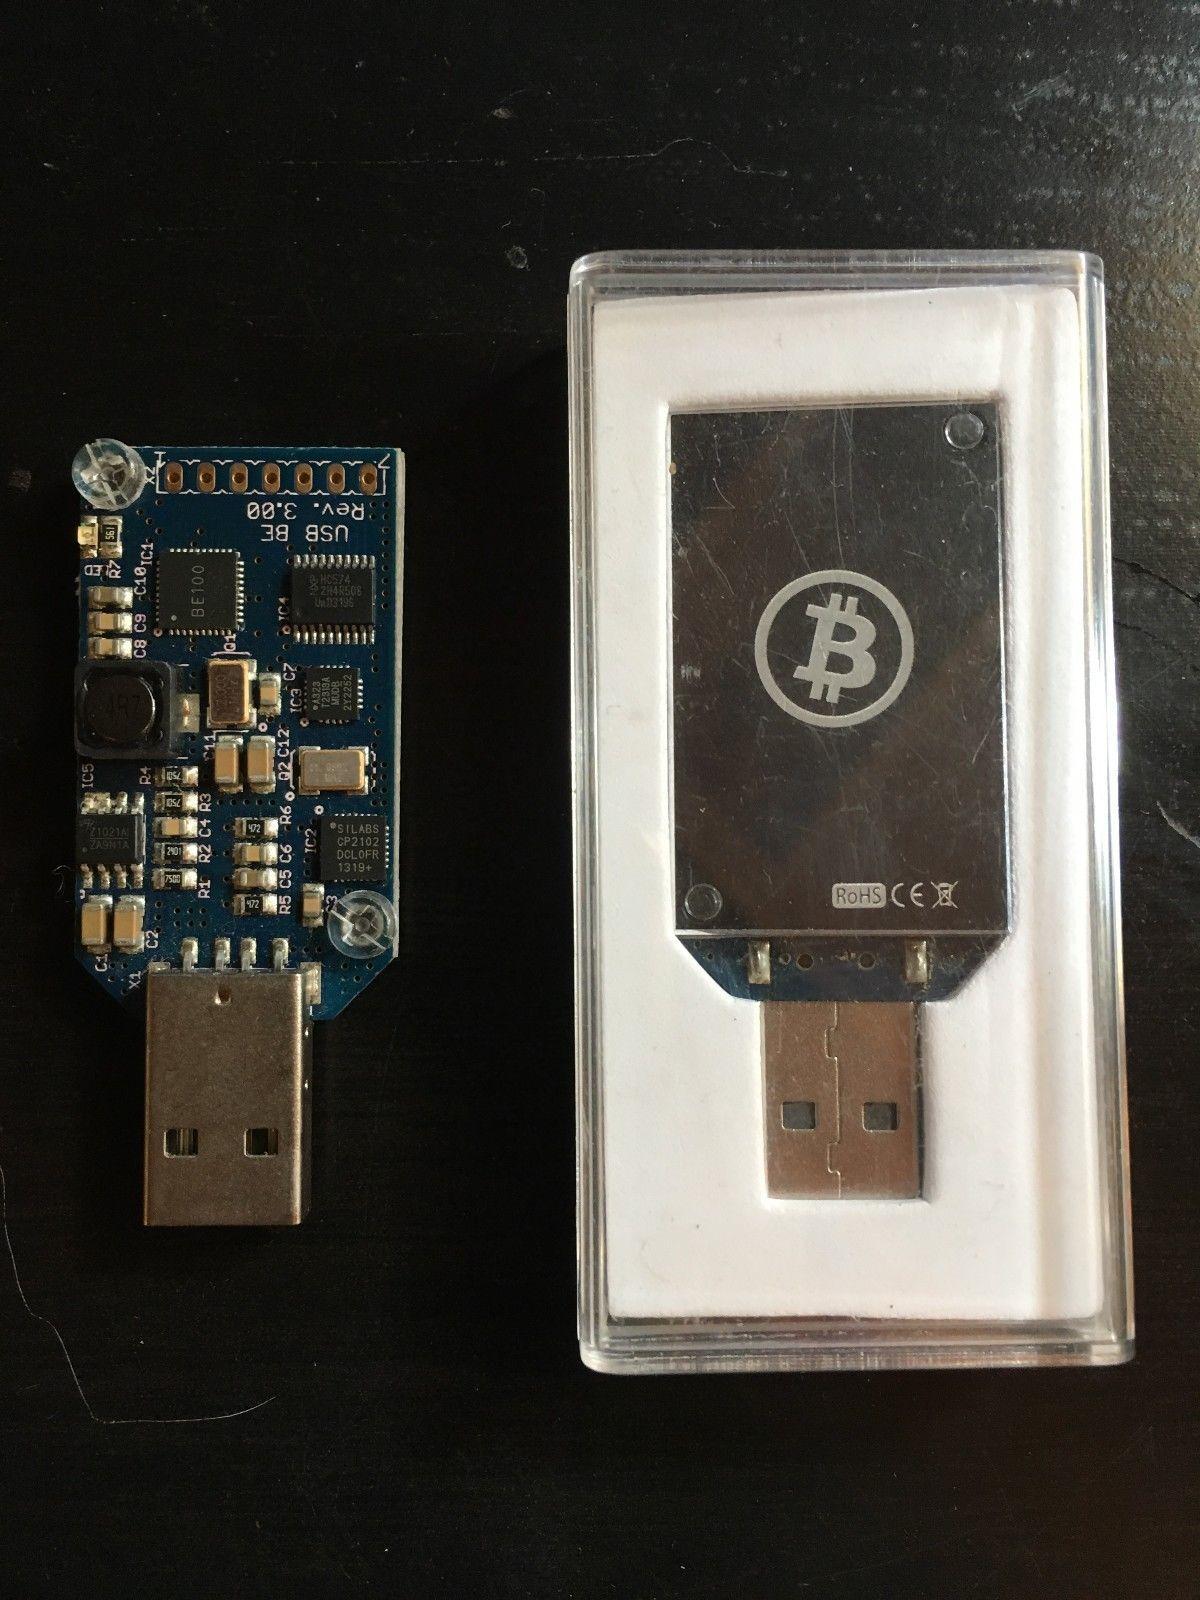 Asic Bitcoin Miner Usb Block Erupter 333 Mh S Btc Cryptocurrency Motherboard Biostar Tb250 Lga 1151 Mining